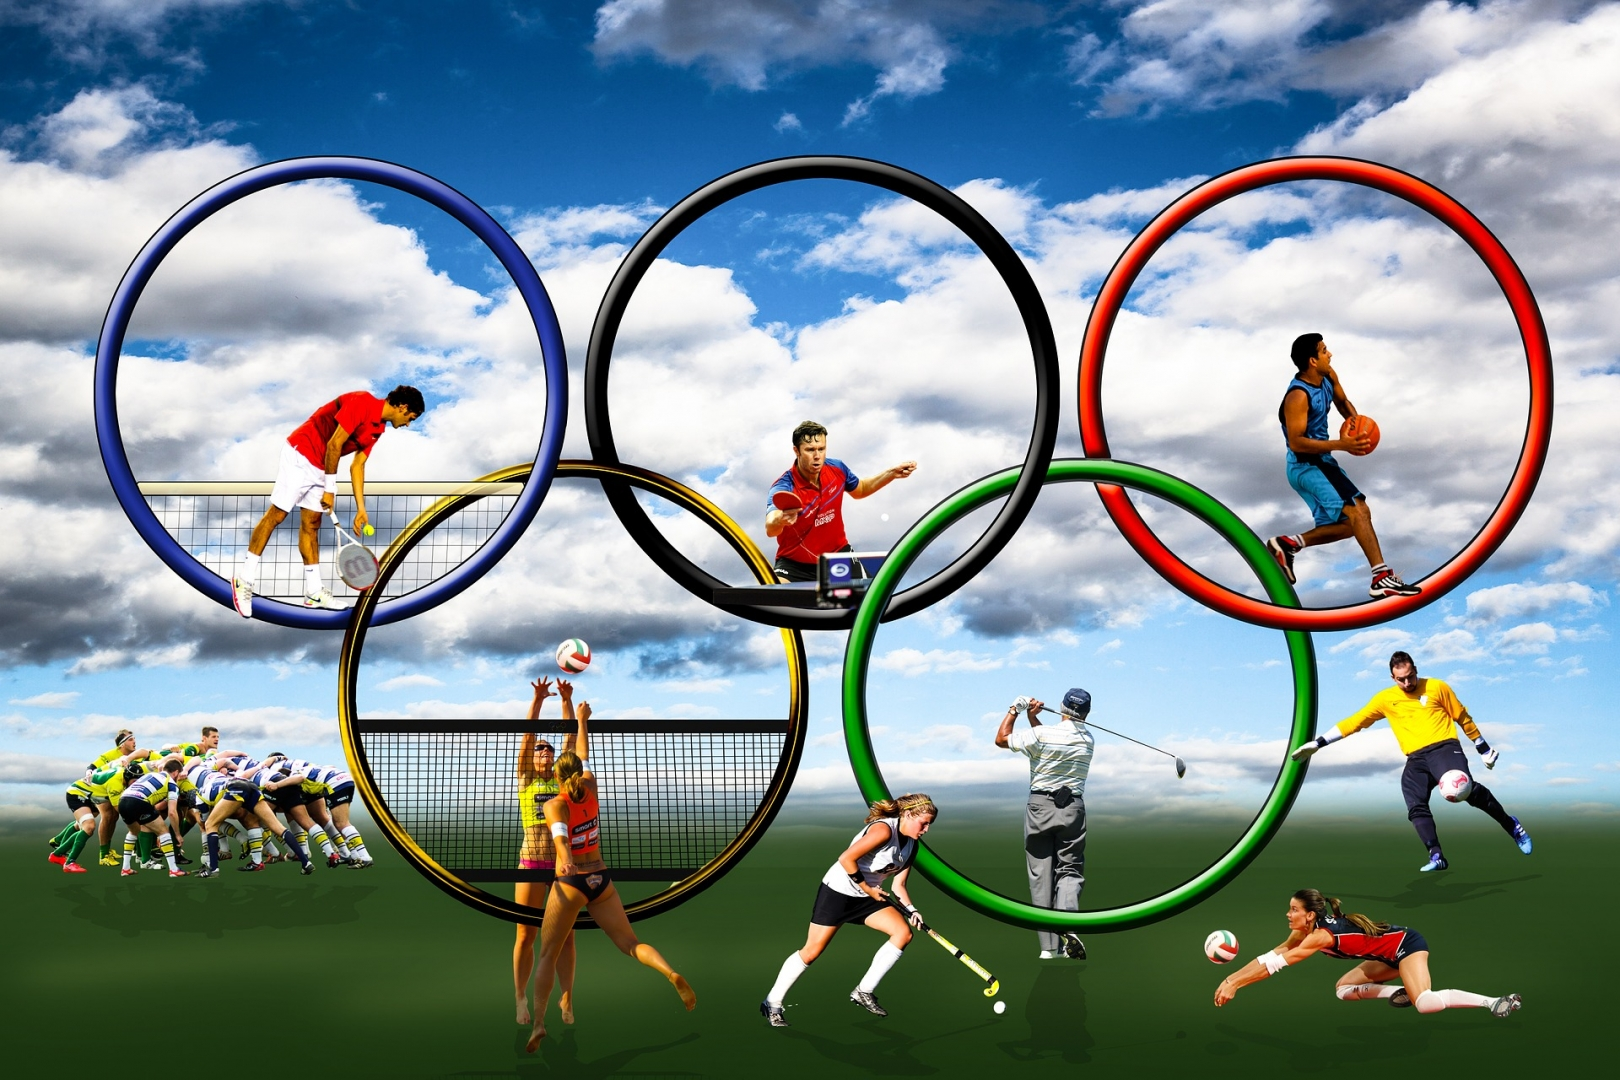 фото коллекции картинок спорт территорией страны